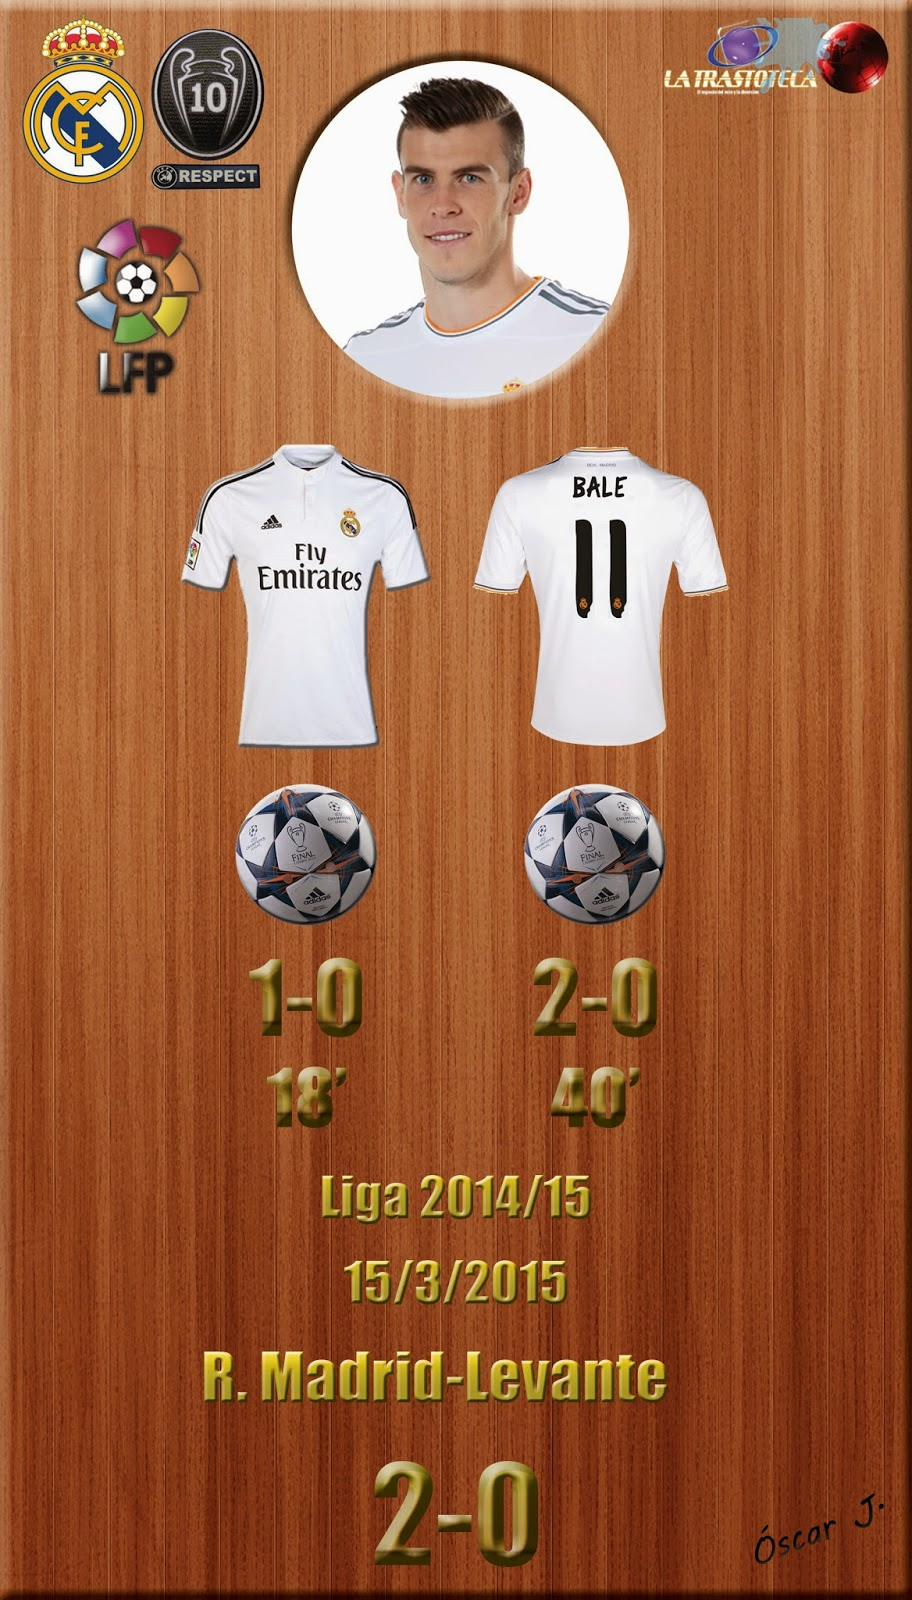 Gareth Bale (Doblete) - Real Madrid 2-0 Levante - Liga 2014/15 - Jornada 27 - (15/3/2015)